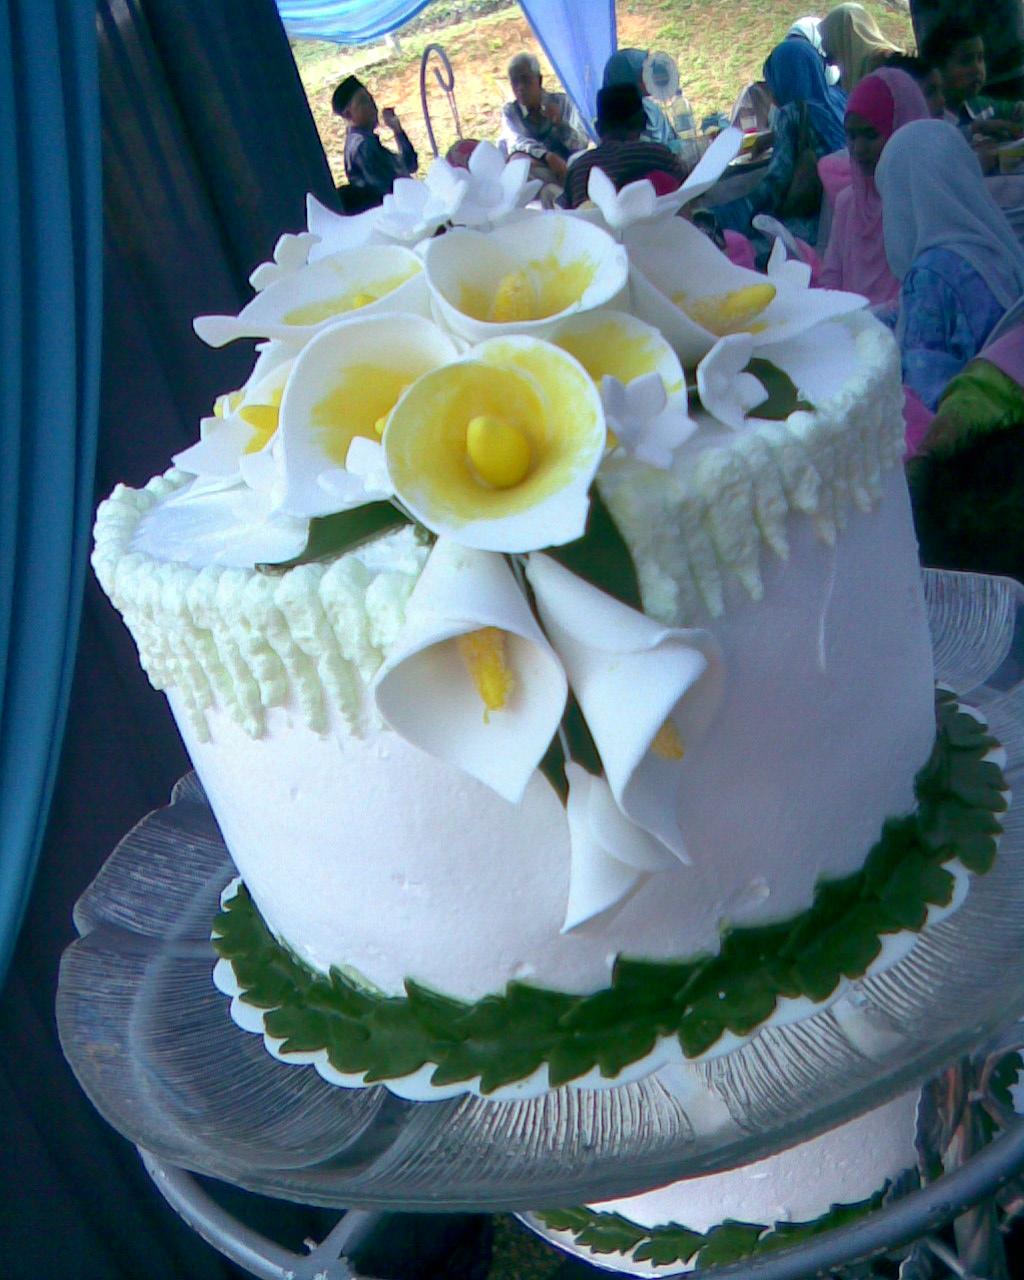 jujucupcakes Calla Lily Wedding Cake